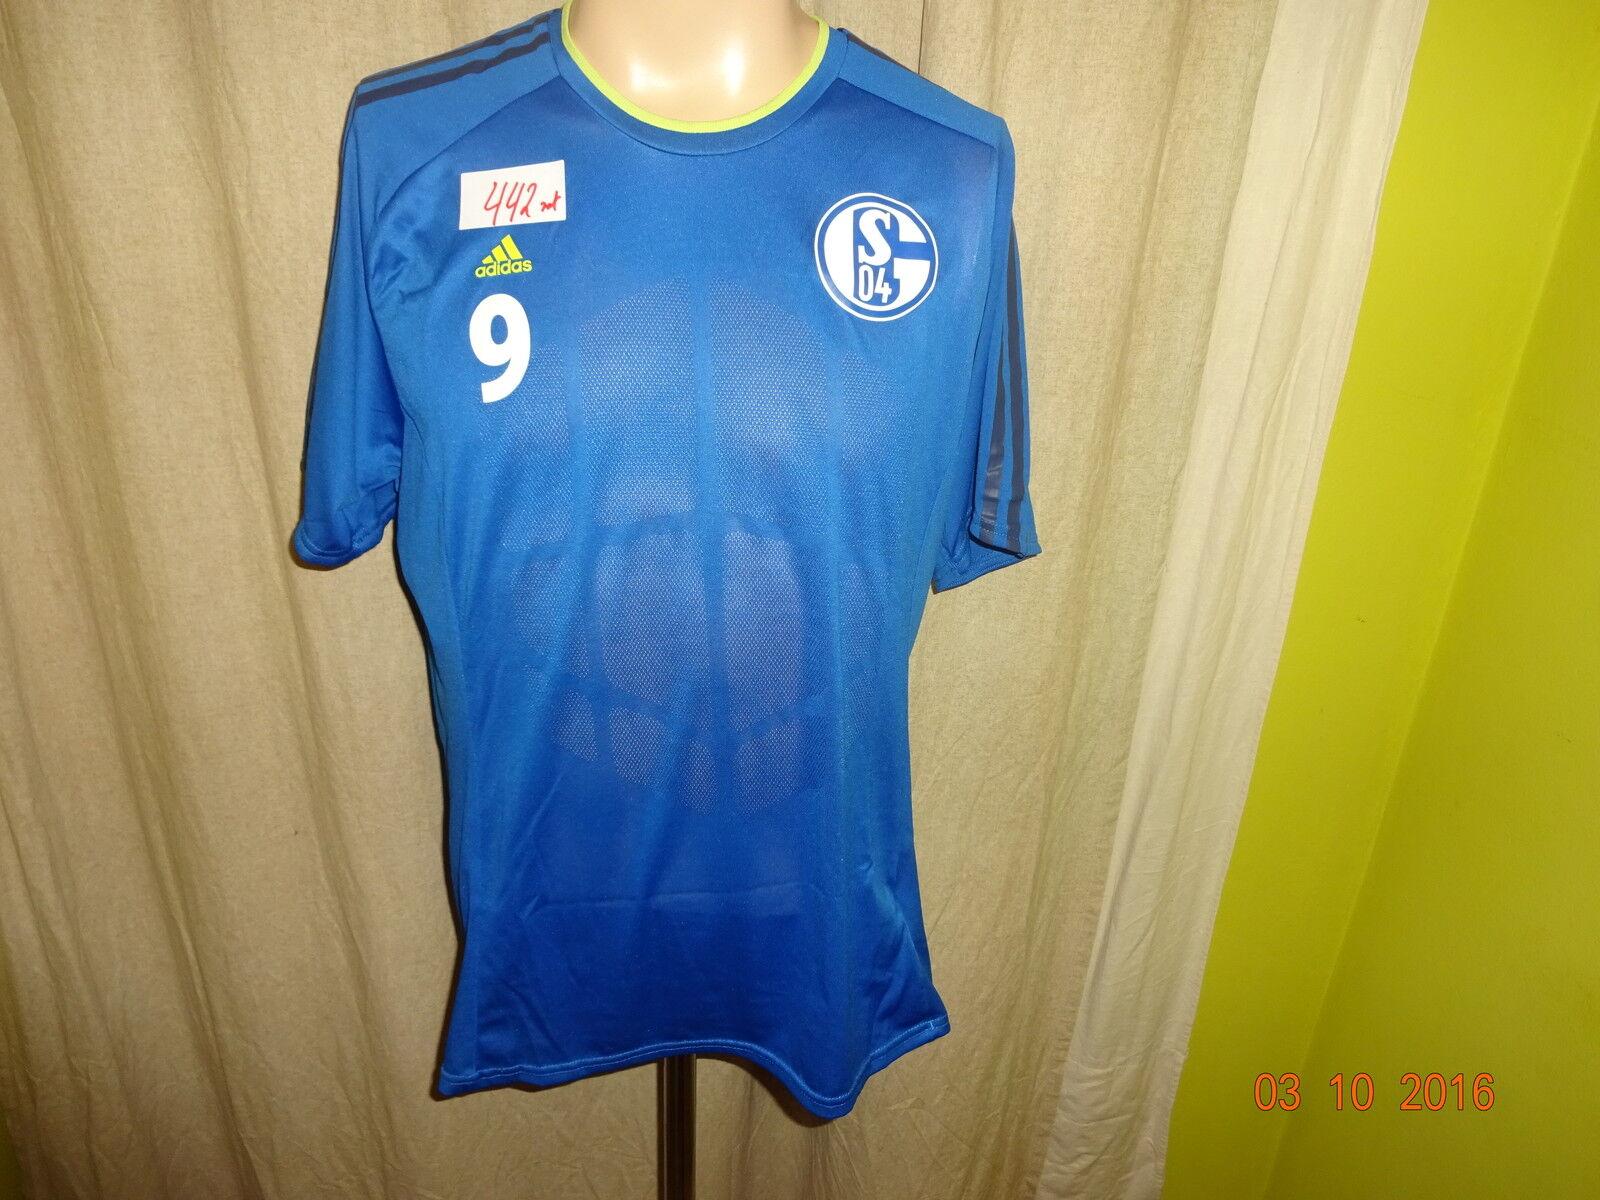 FC Schalke 04 Original Adidas Spieler Training Trikot 2013 2013 2013 14 + Nr.9 Gr.L 917972